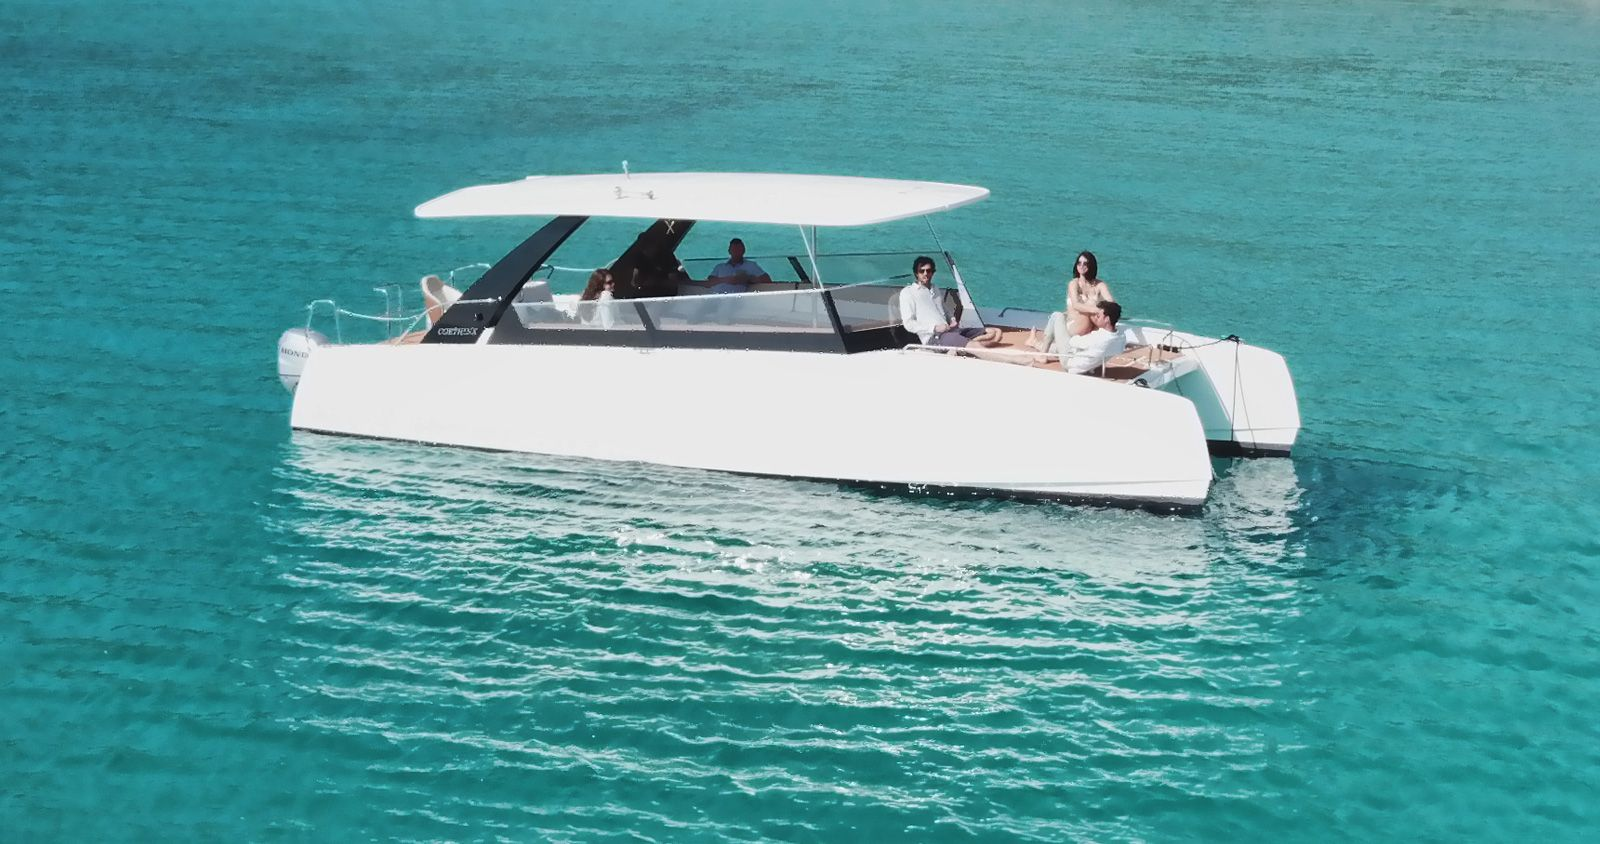 catamarans corthinx pontoon boat boat stuff boat plans catamaran product design [ 1600 x 844 Pixel ]